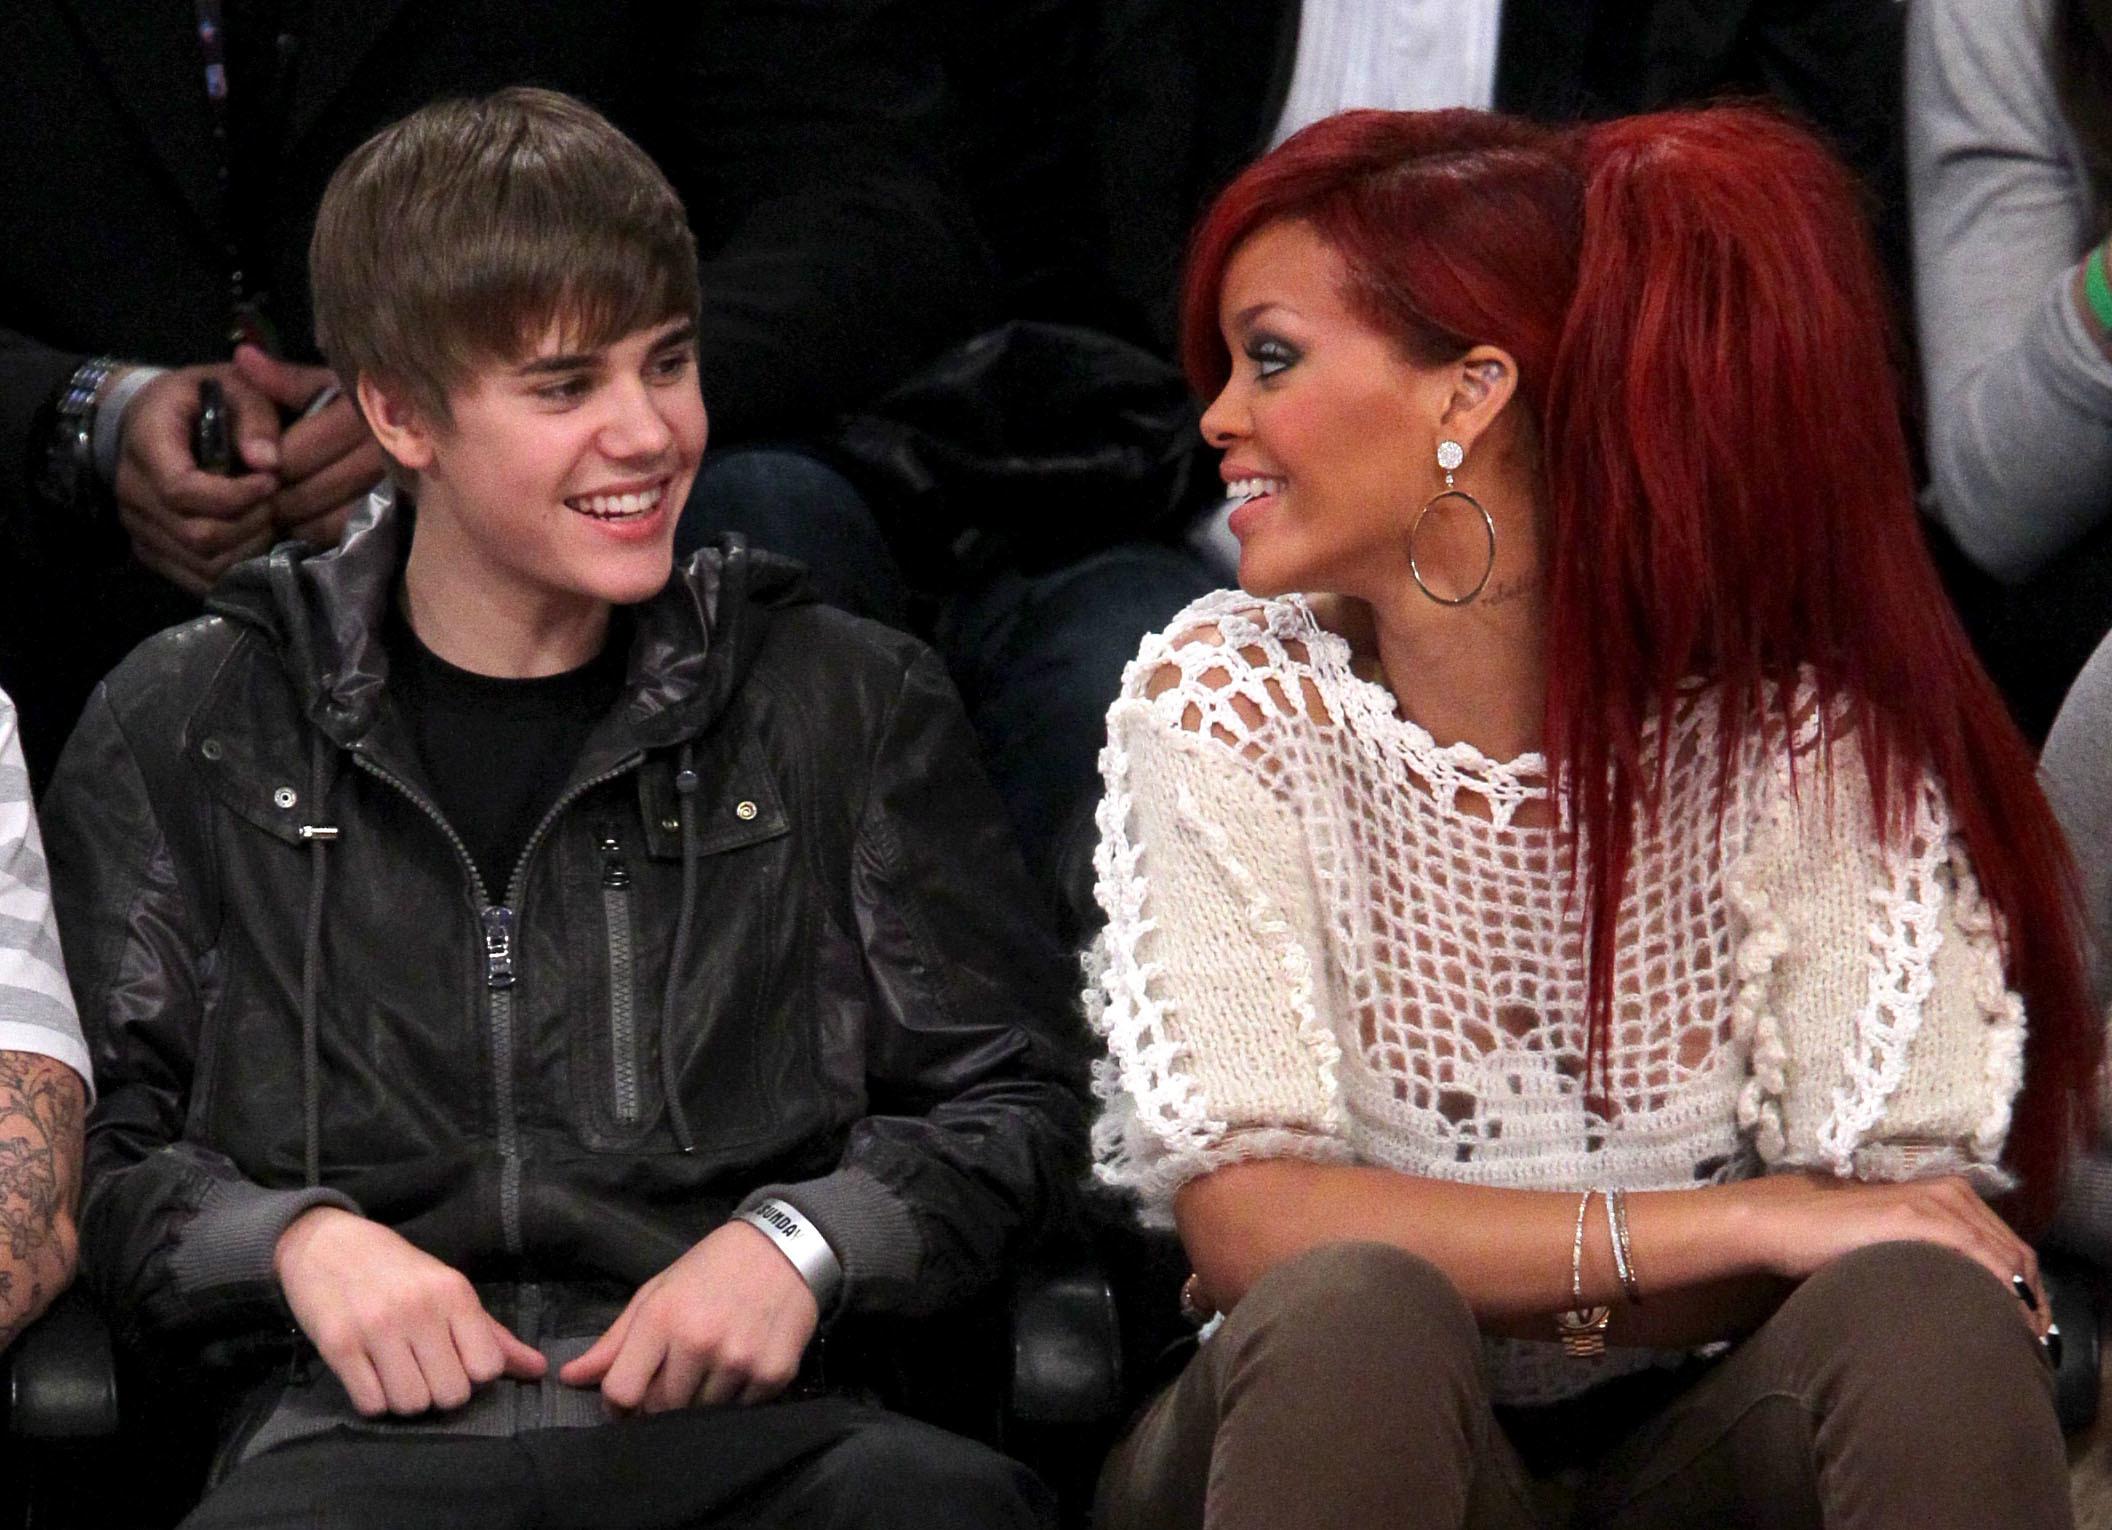 Rihanna Justin Bieber Selena Gomez affair Wonderwall gossip